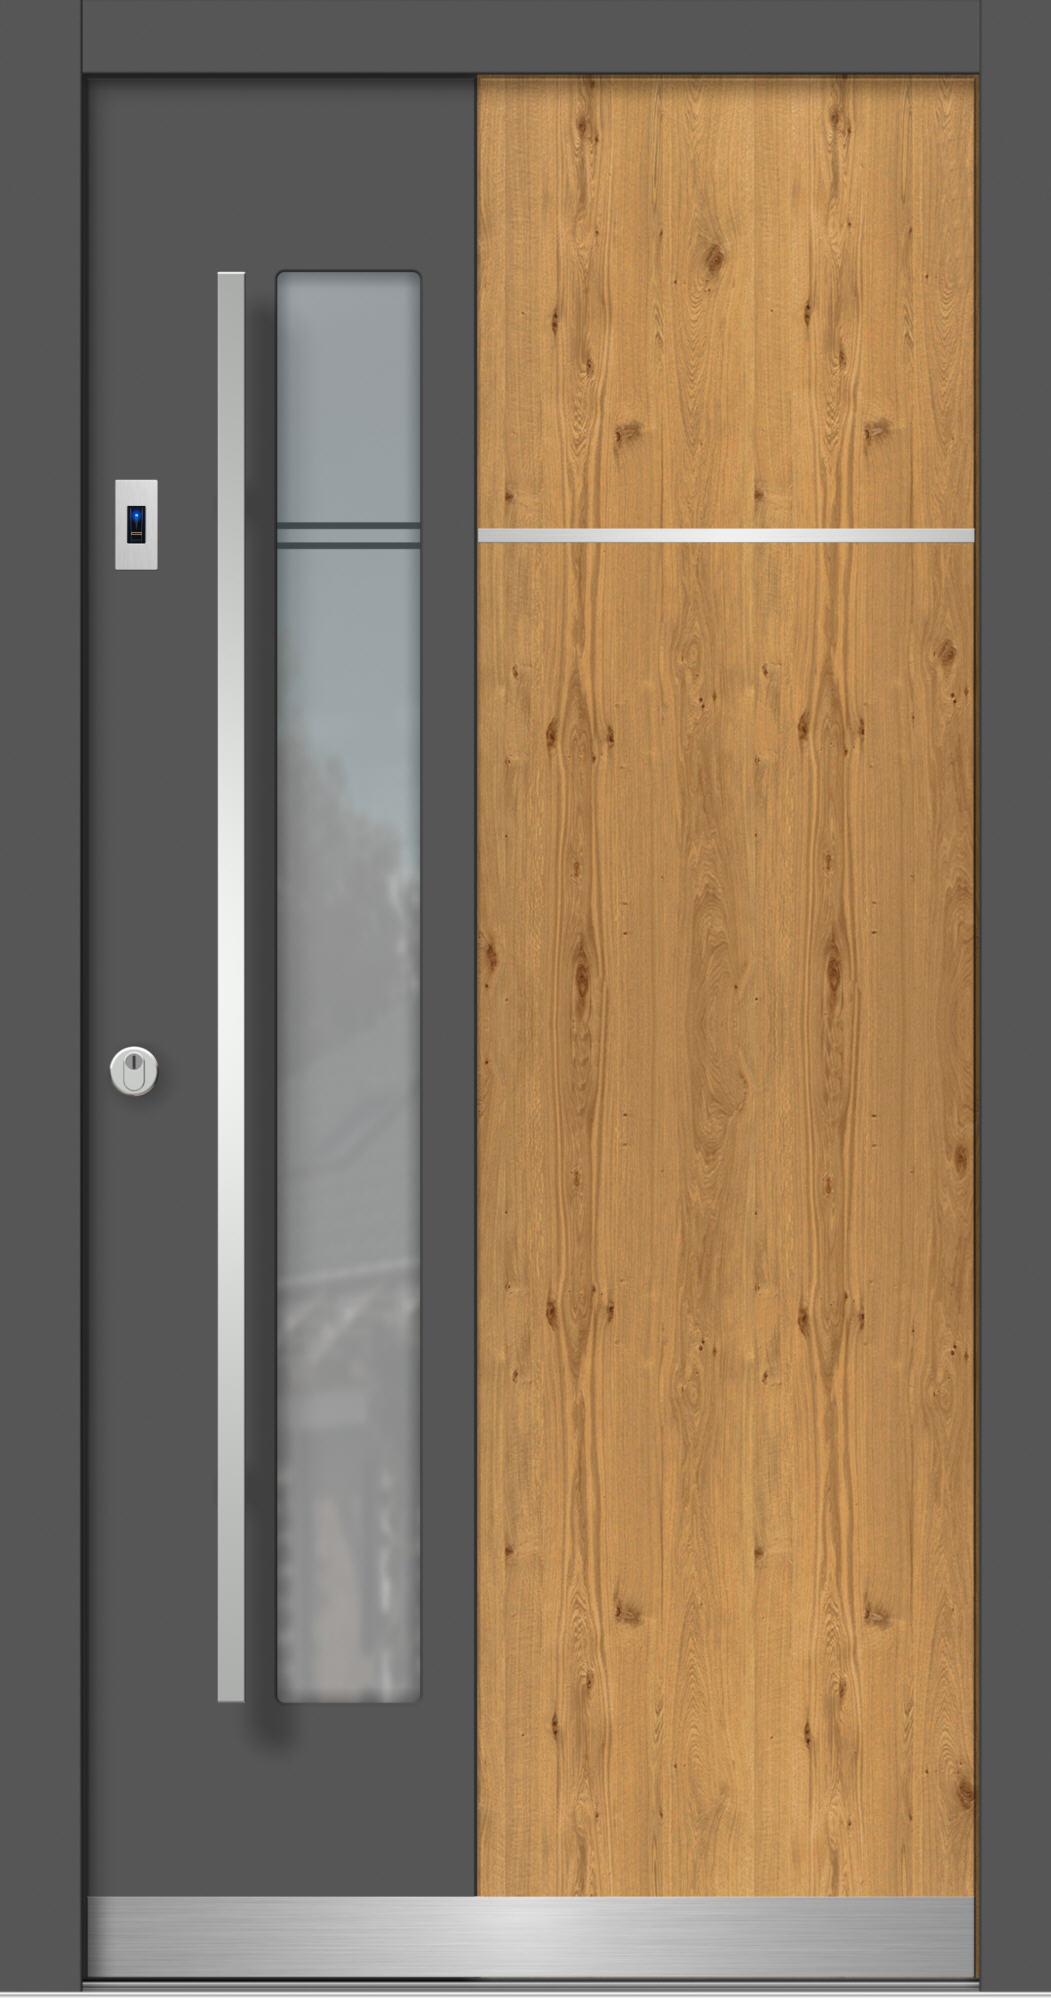 haust ren direkt haust ren holz fichte. Black Bedroom Furniture Sets. Home Design Ideas